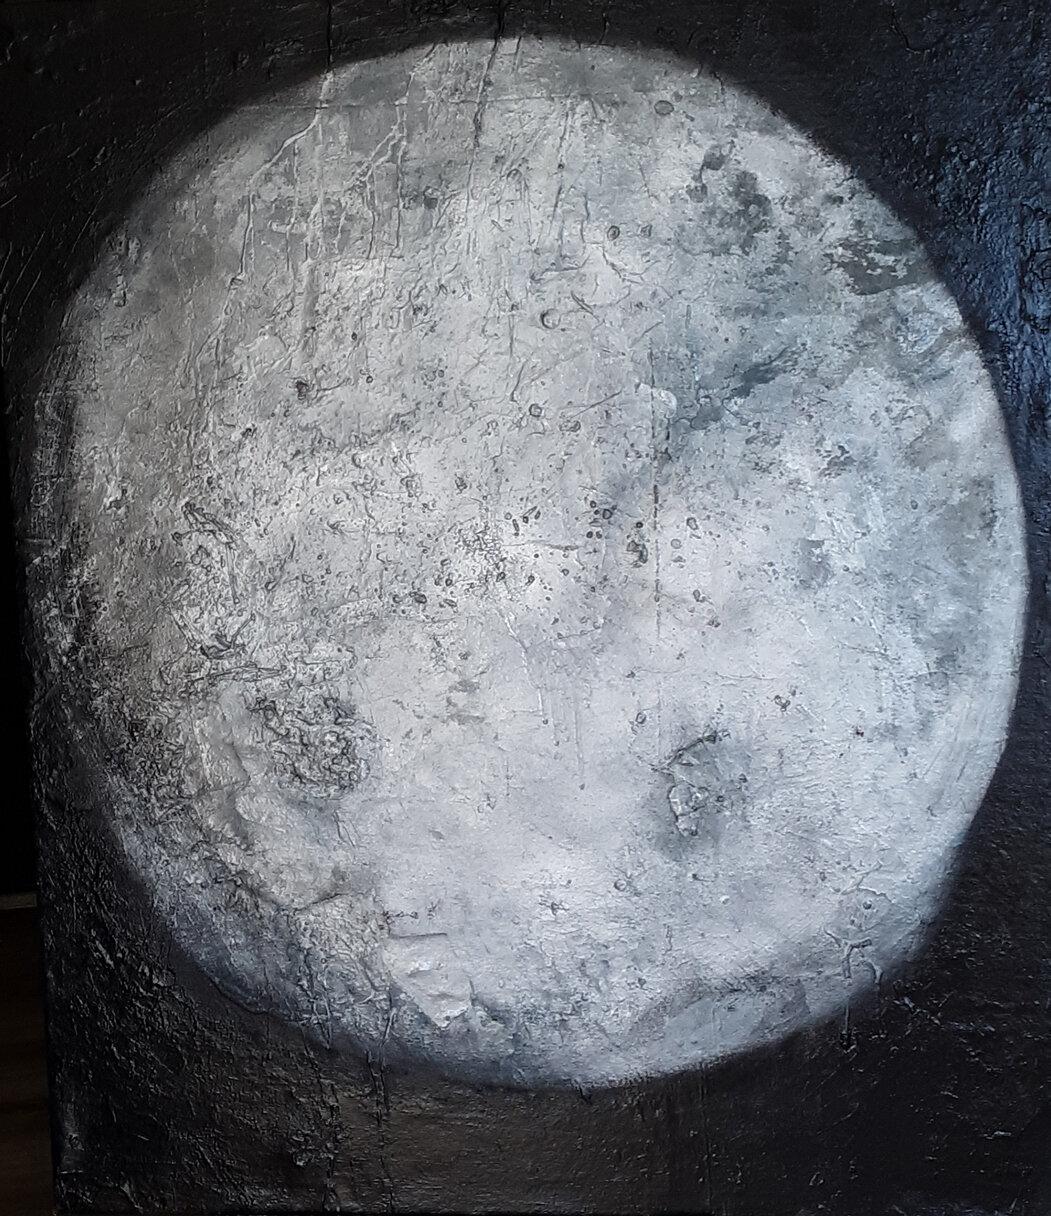 MoonNot-Scorched_29x35*.jpg